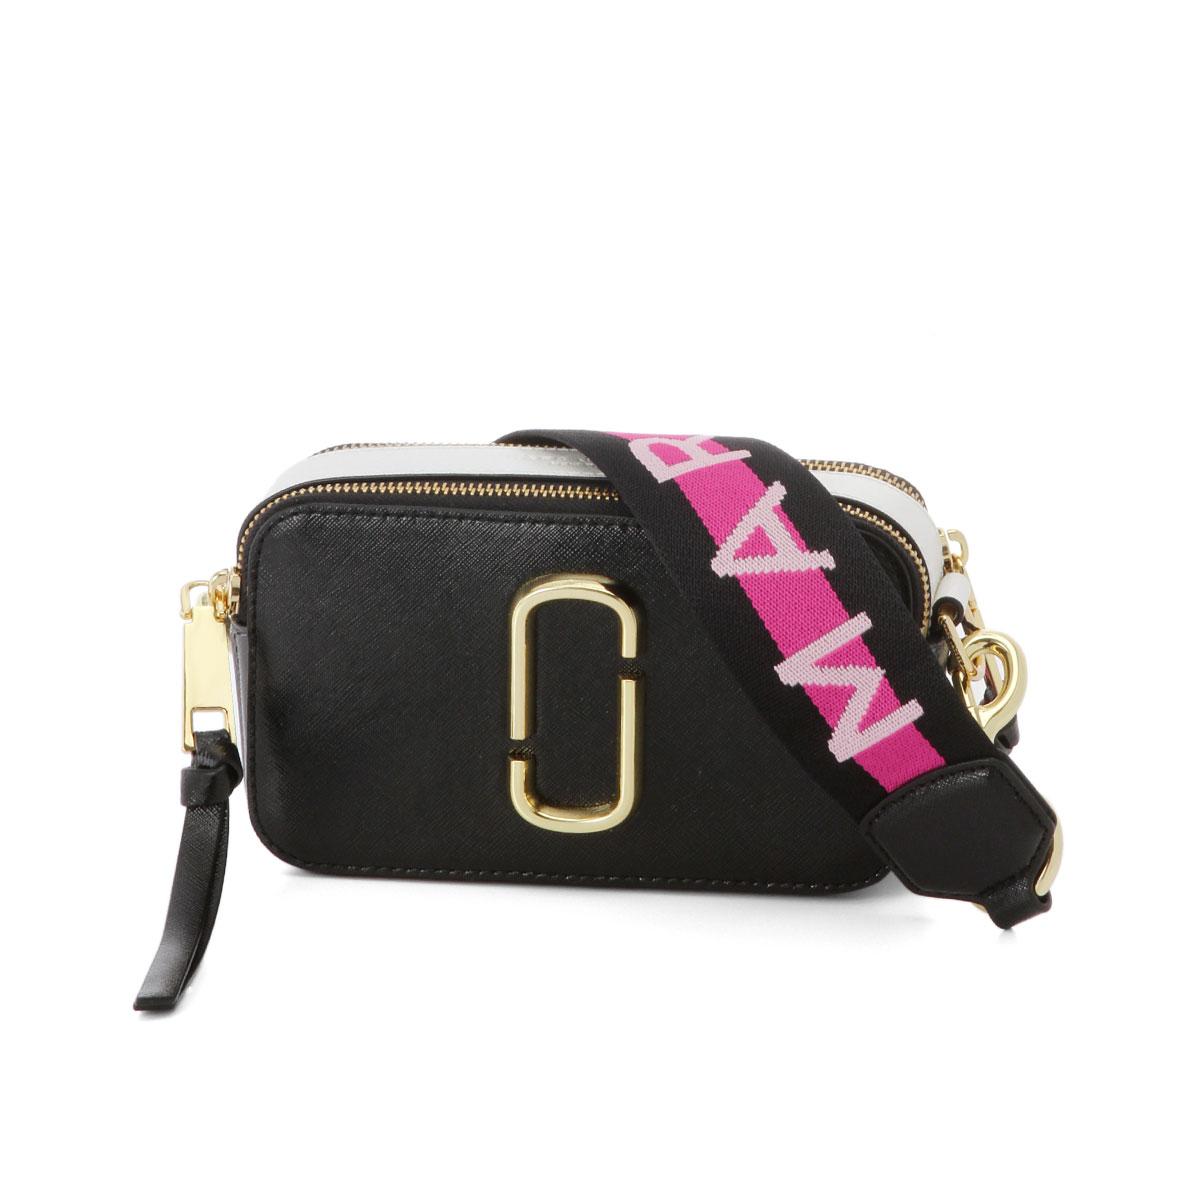 b5c83a163be importshopdouble: Mark Jacobs MARC JACOBS bag lady M0014146 002 shoulder bag  SNAPSHOT snapshot BLACK MULTI black | Rakuten Global Market